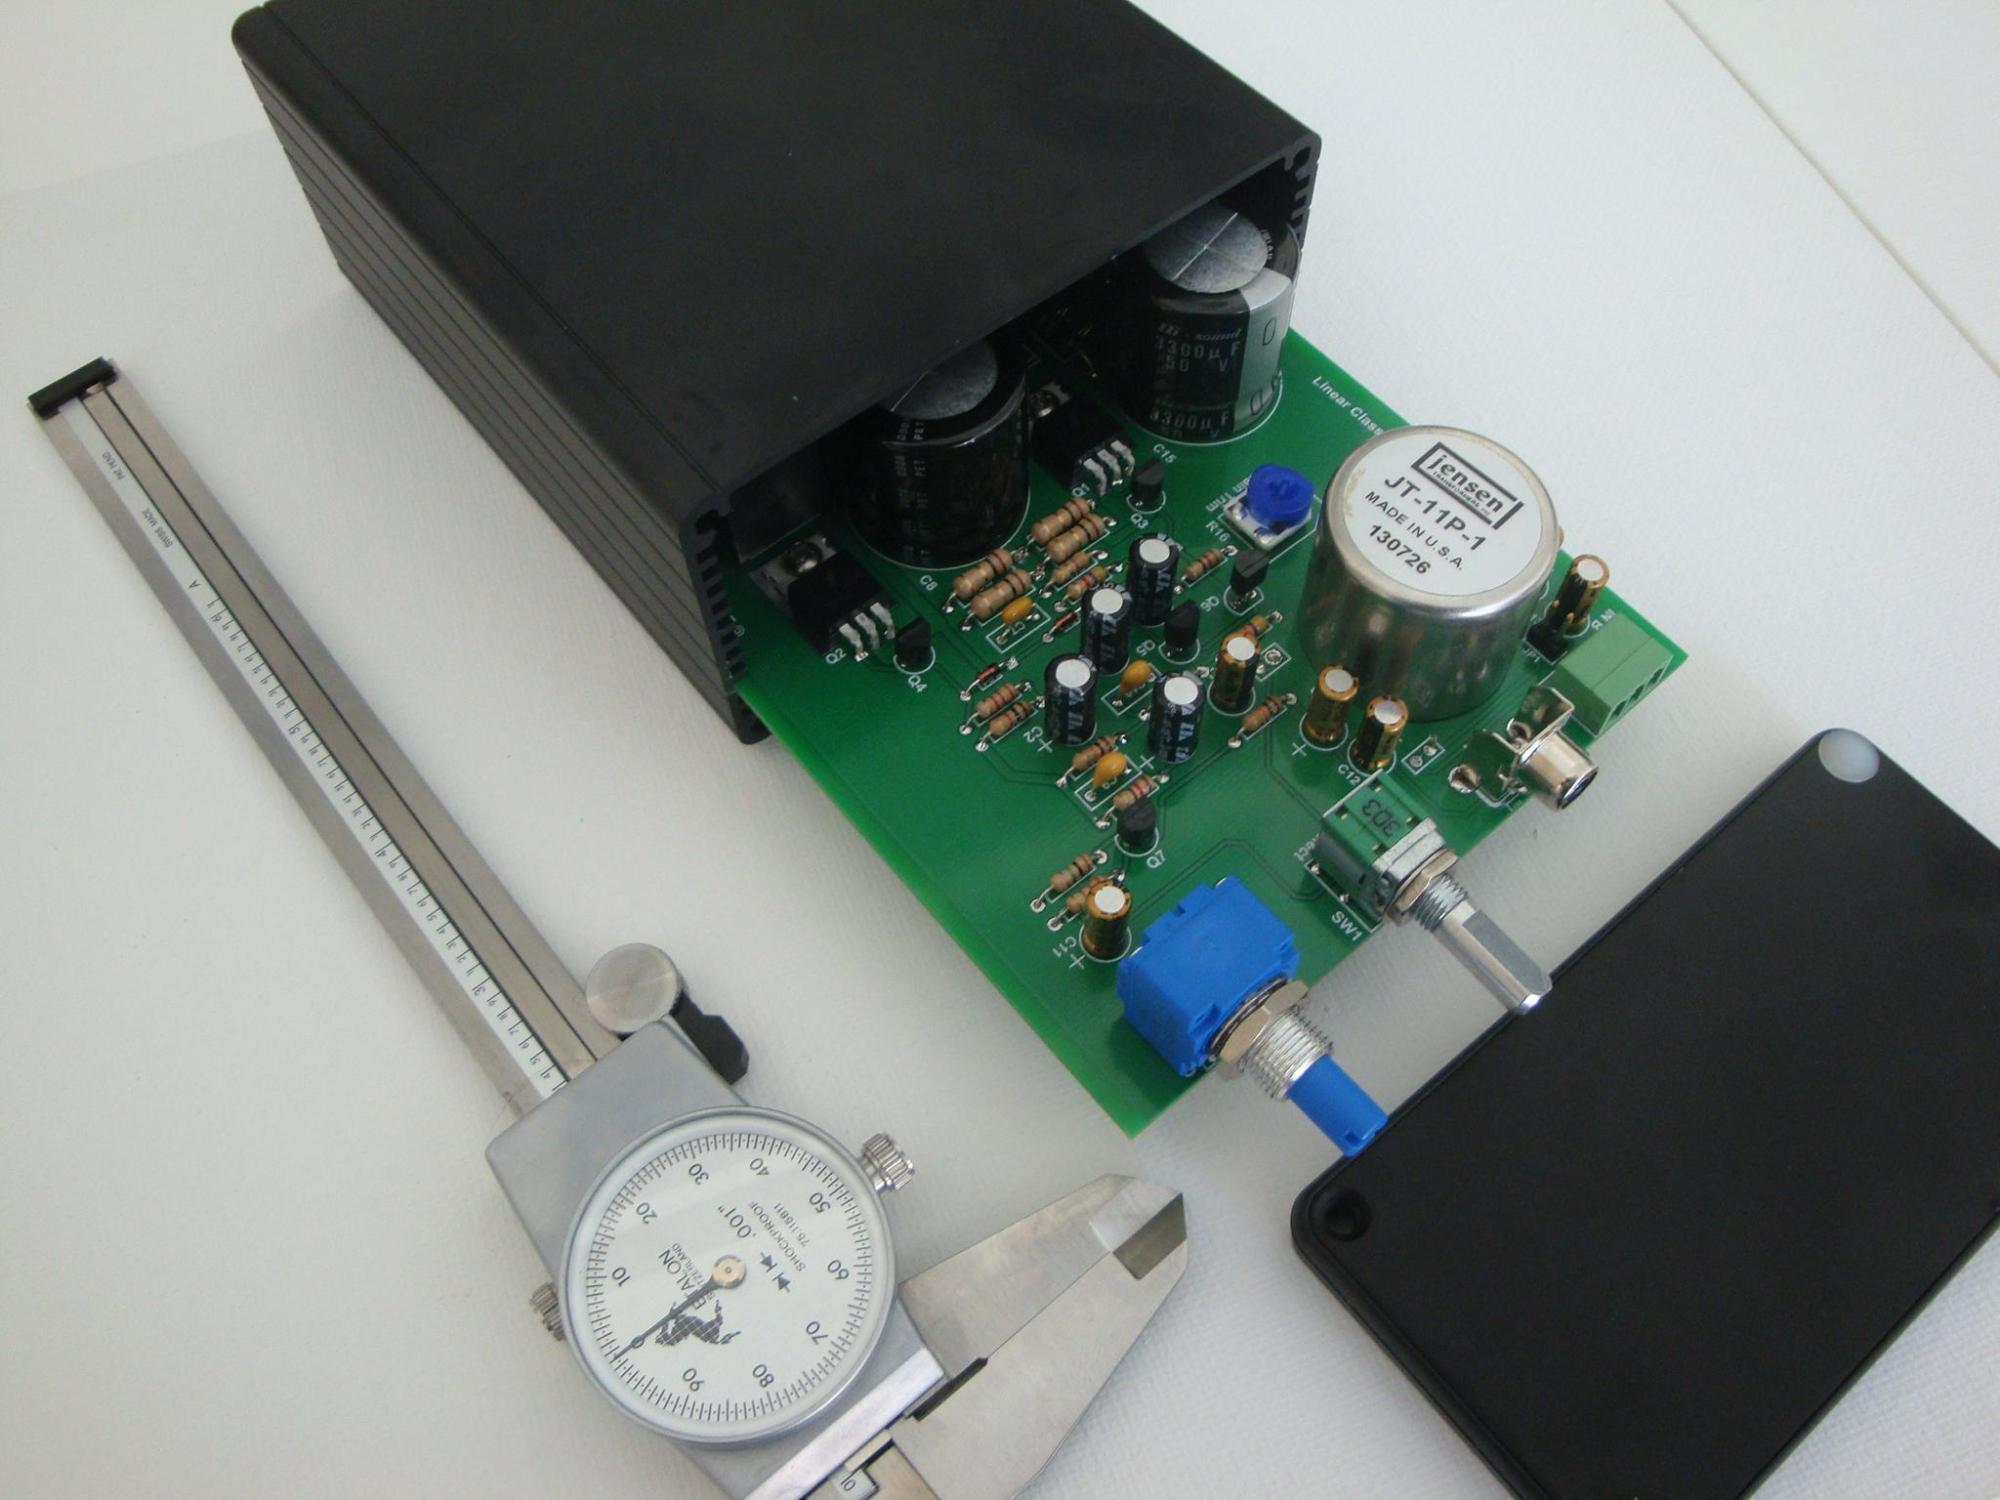 hight resolution of vna 2180 common mode filter test jig